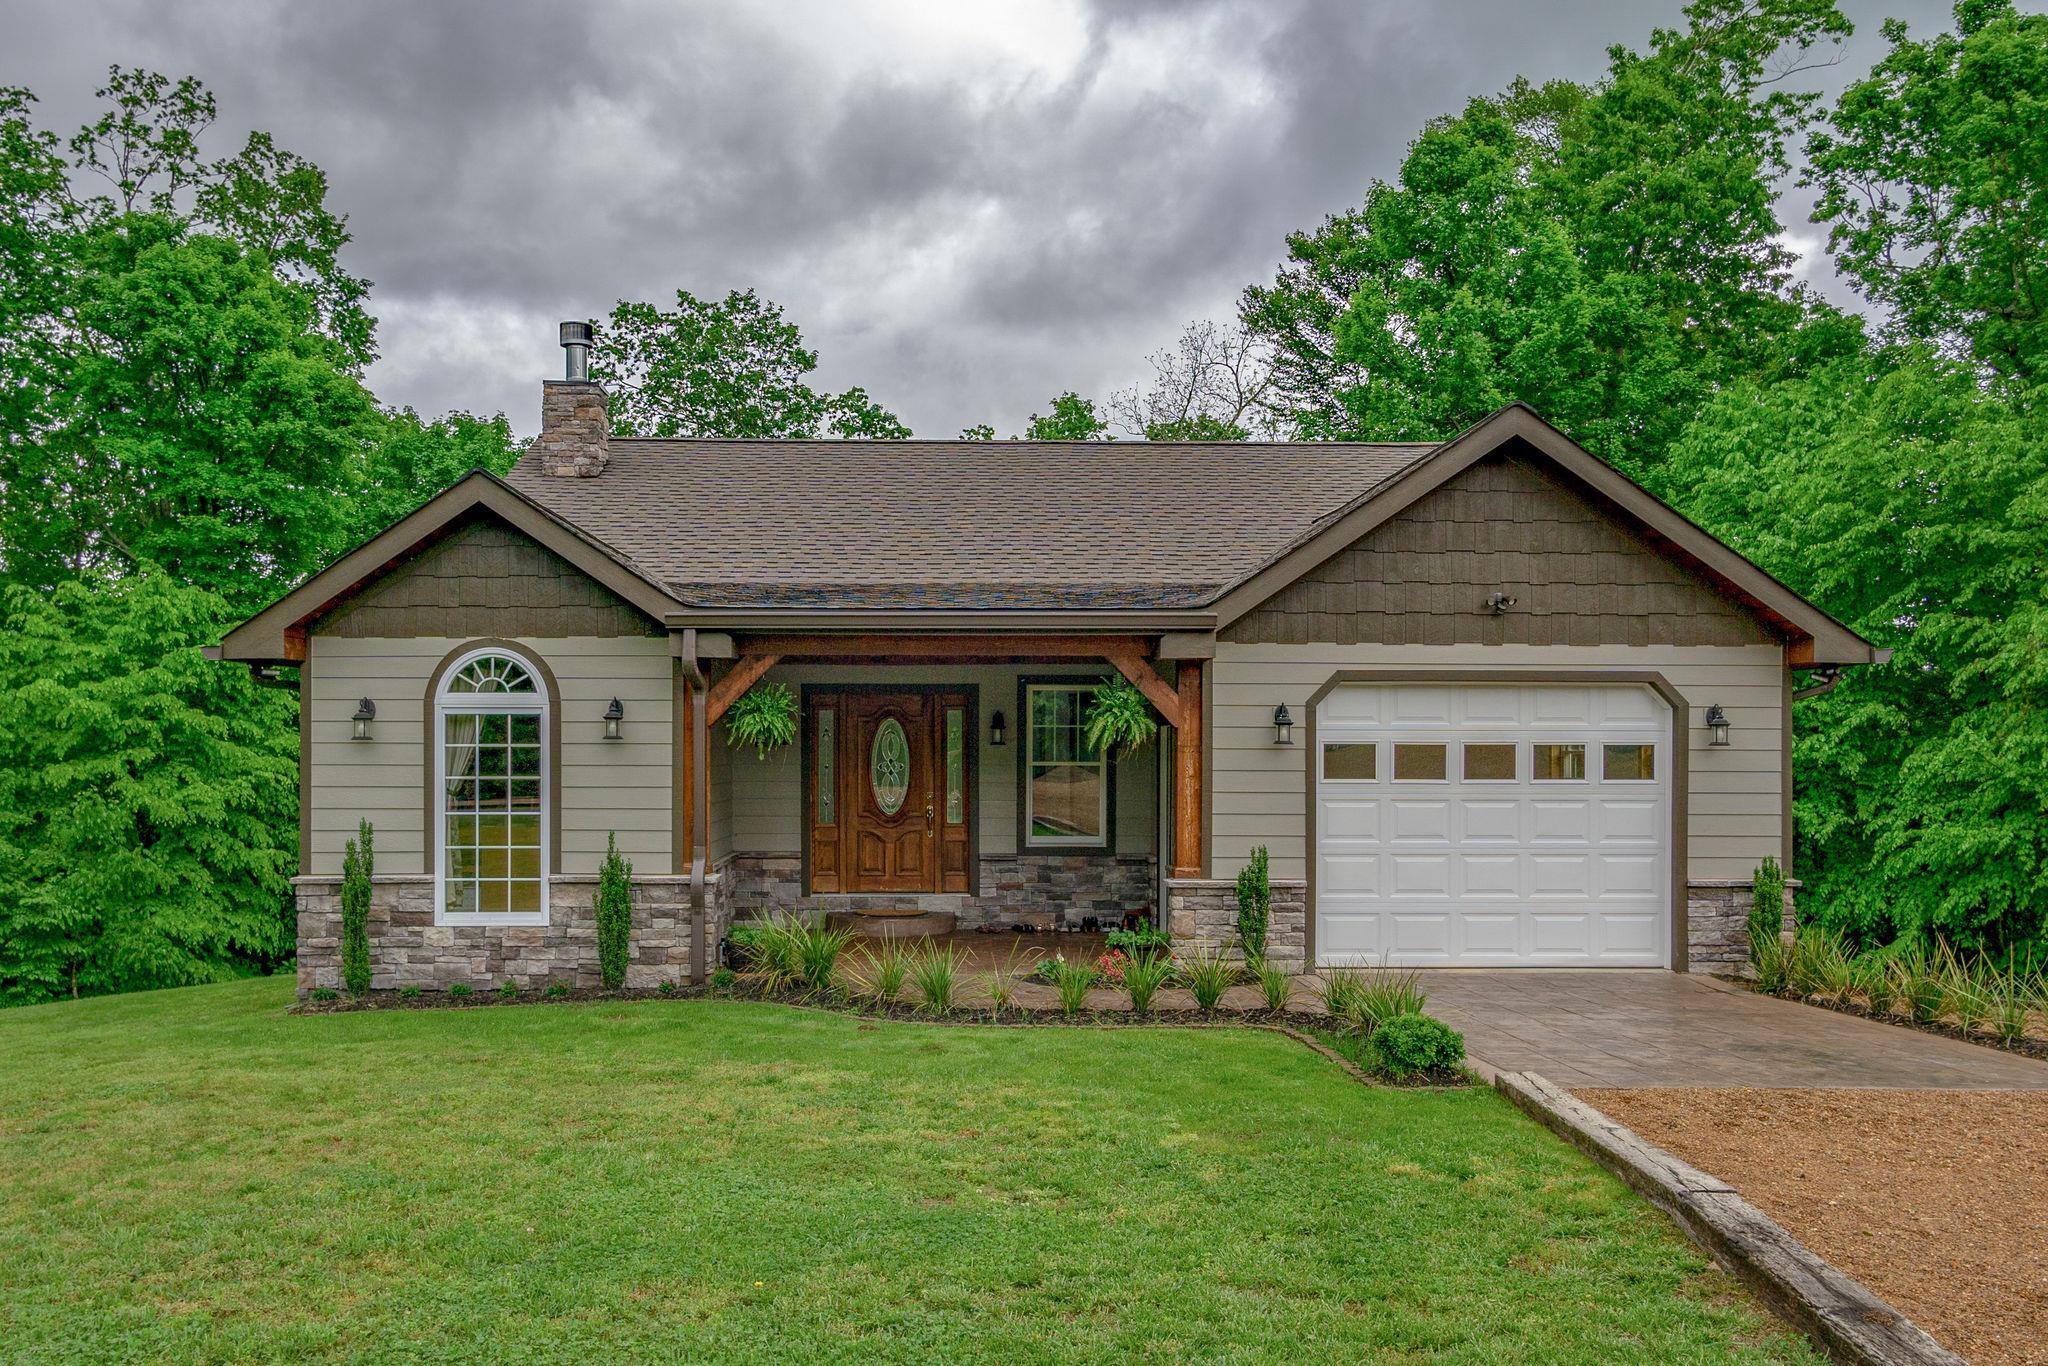 905 Burns Hill Rd, Lobelville, TN 37097 - Lobelville, TN real estate listing